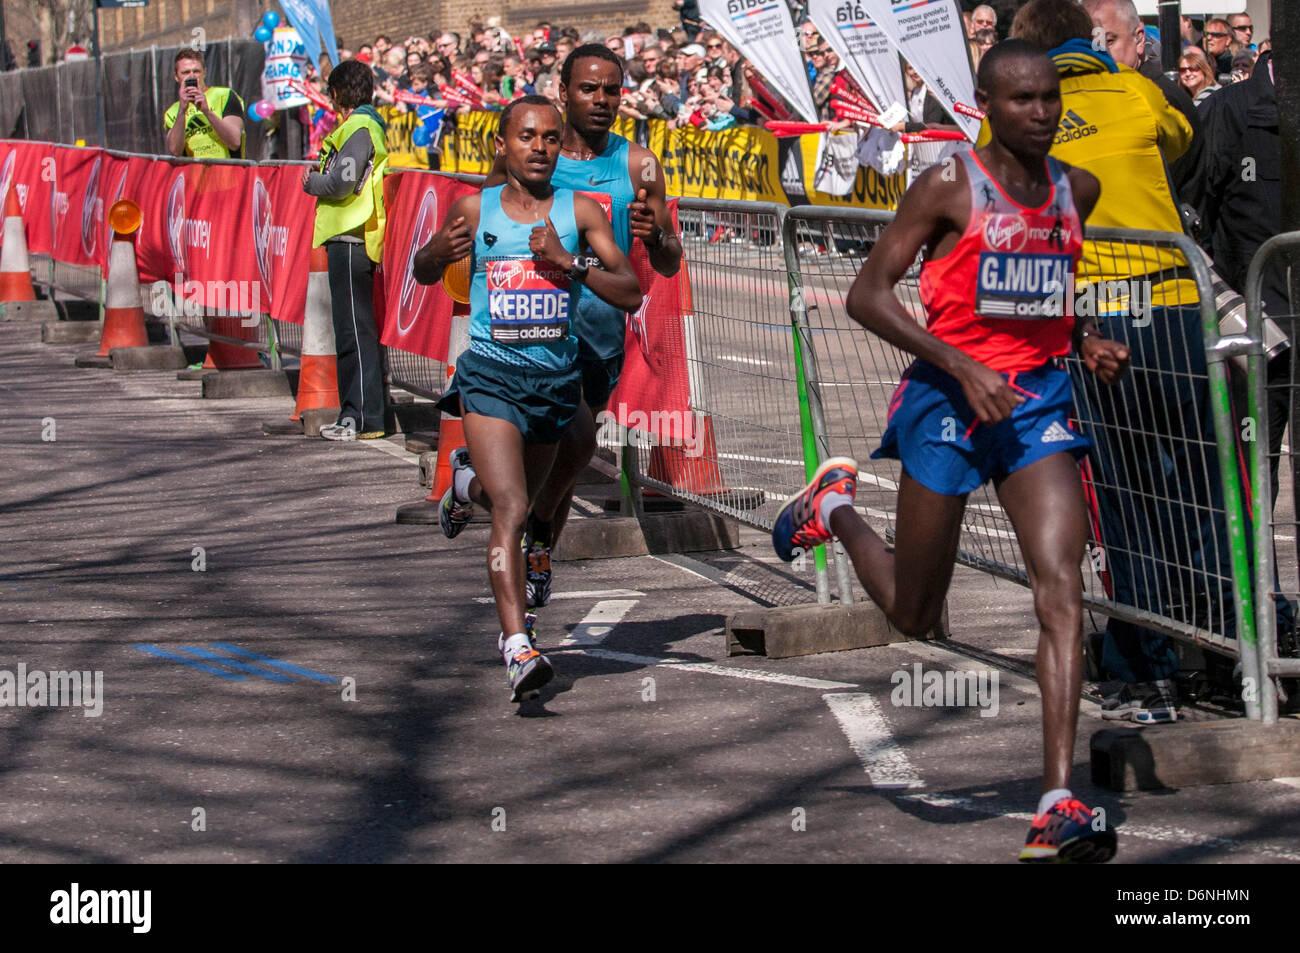 LONDON, East Smithfield, 21 April 2013.  Tsegaye Kebede, Ethiopia, at the back of the Elite Men's group, just - Stock Image